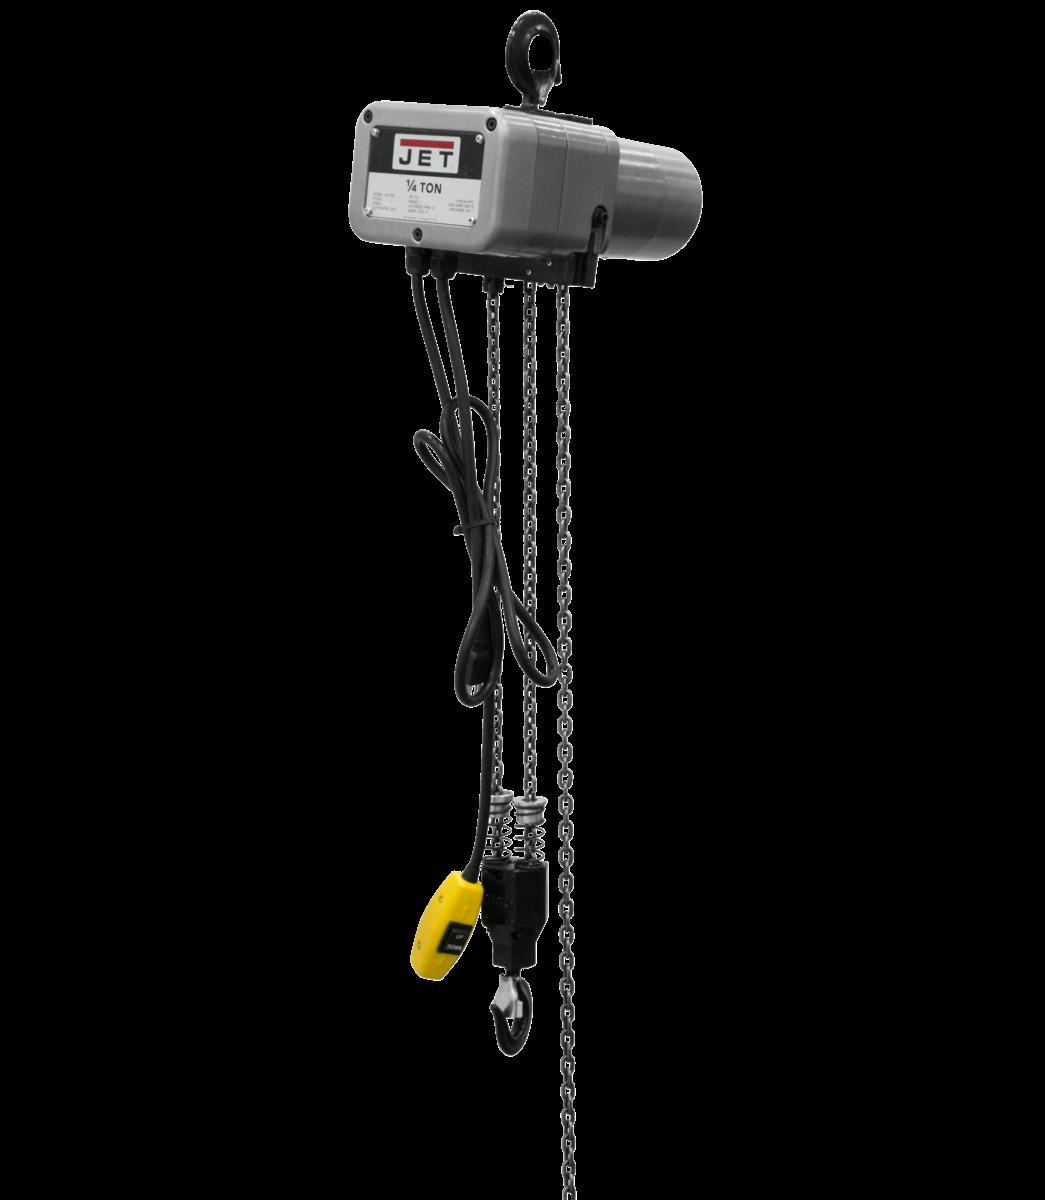 JSH-550-10 1/4-Ton Electric Chain Hoist 1-Phase 10' Lift